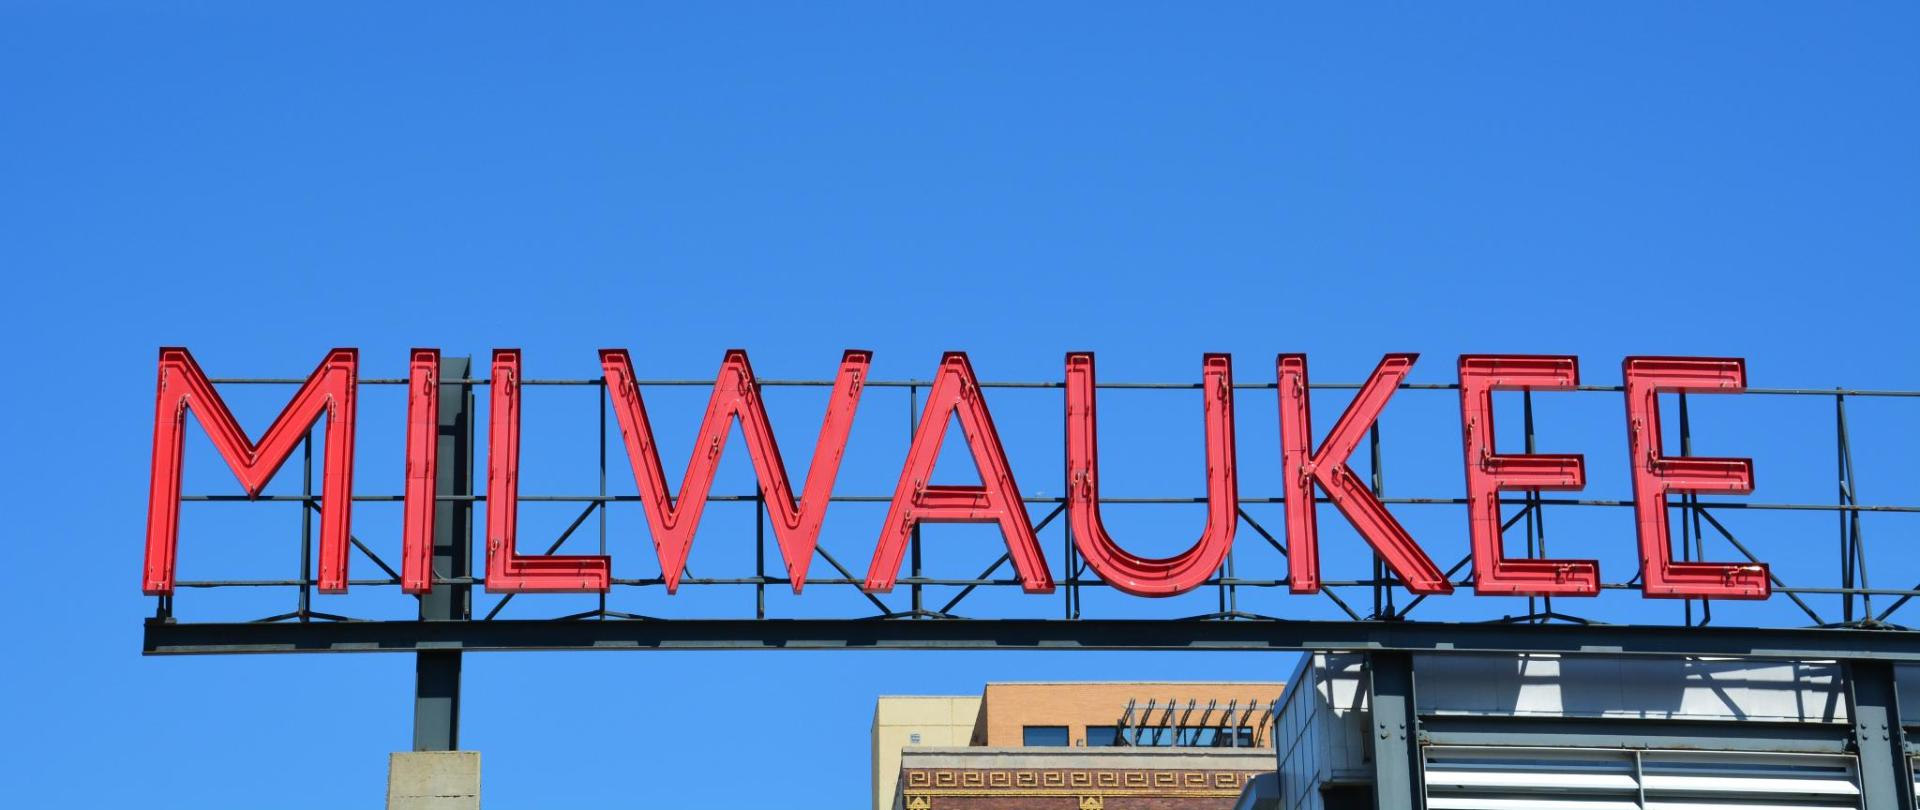 Sign for Milwaukee.jpg